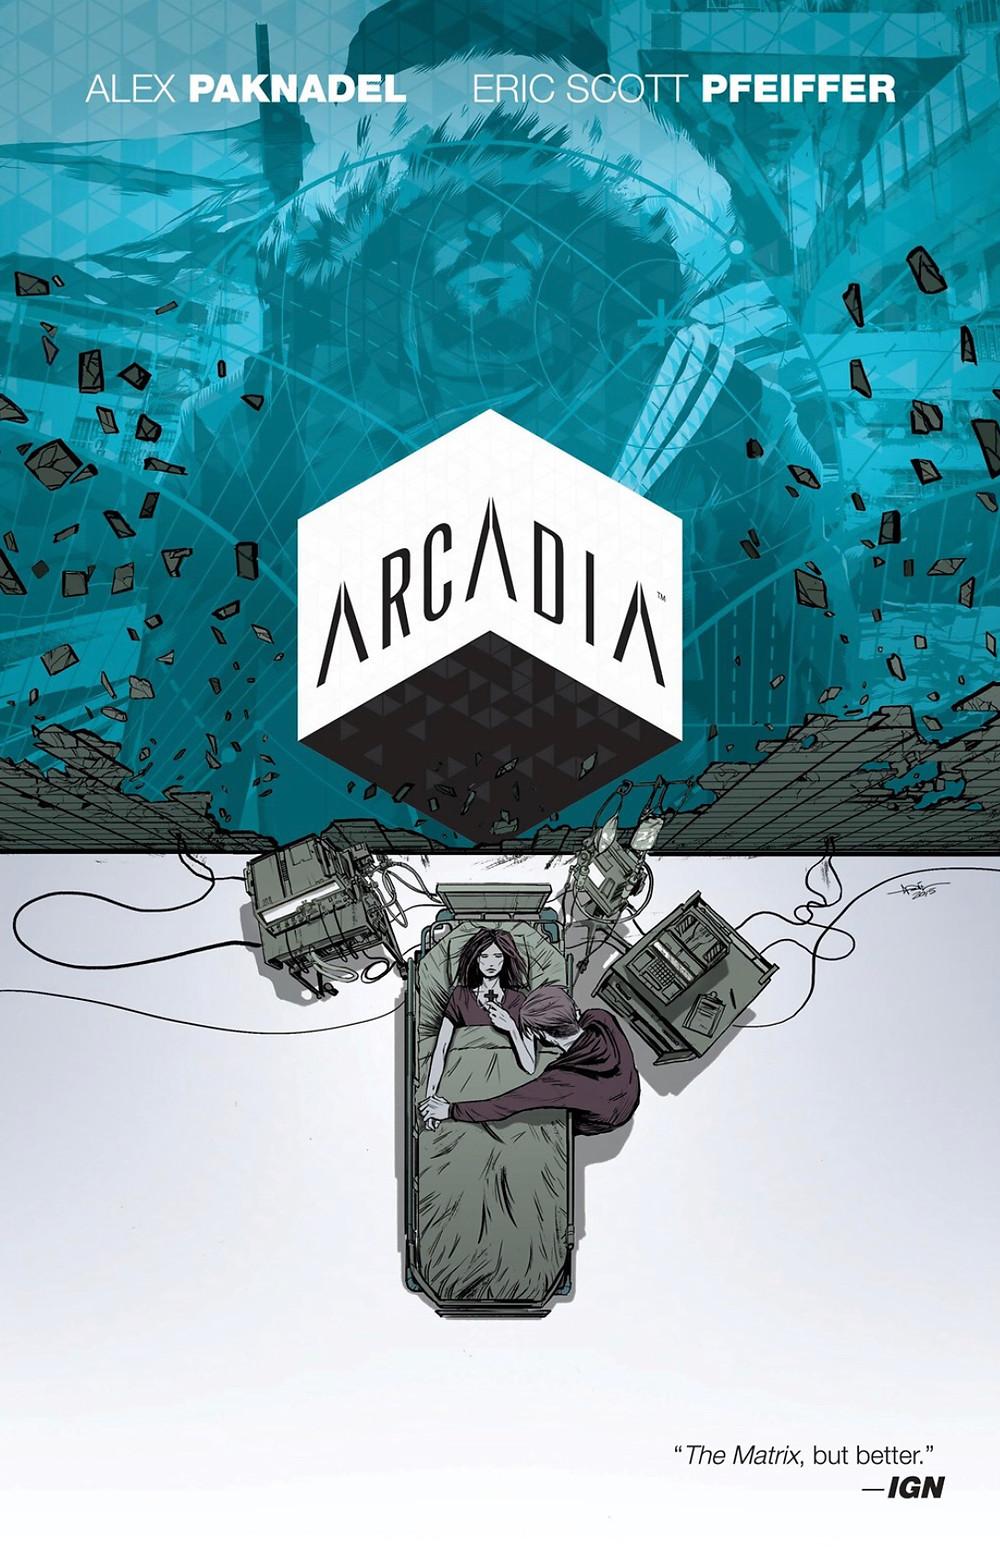 Arcadia, cover, BOOM! Studios, Paknadel/Pfeiffer